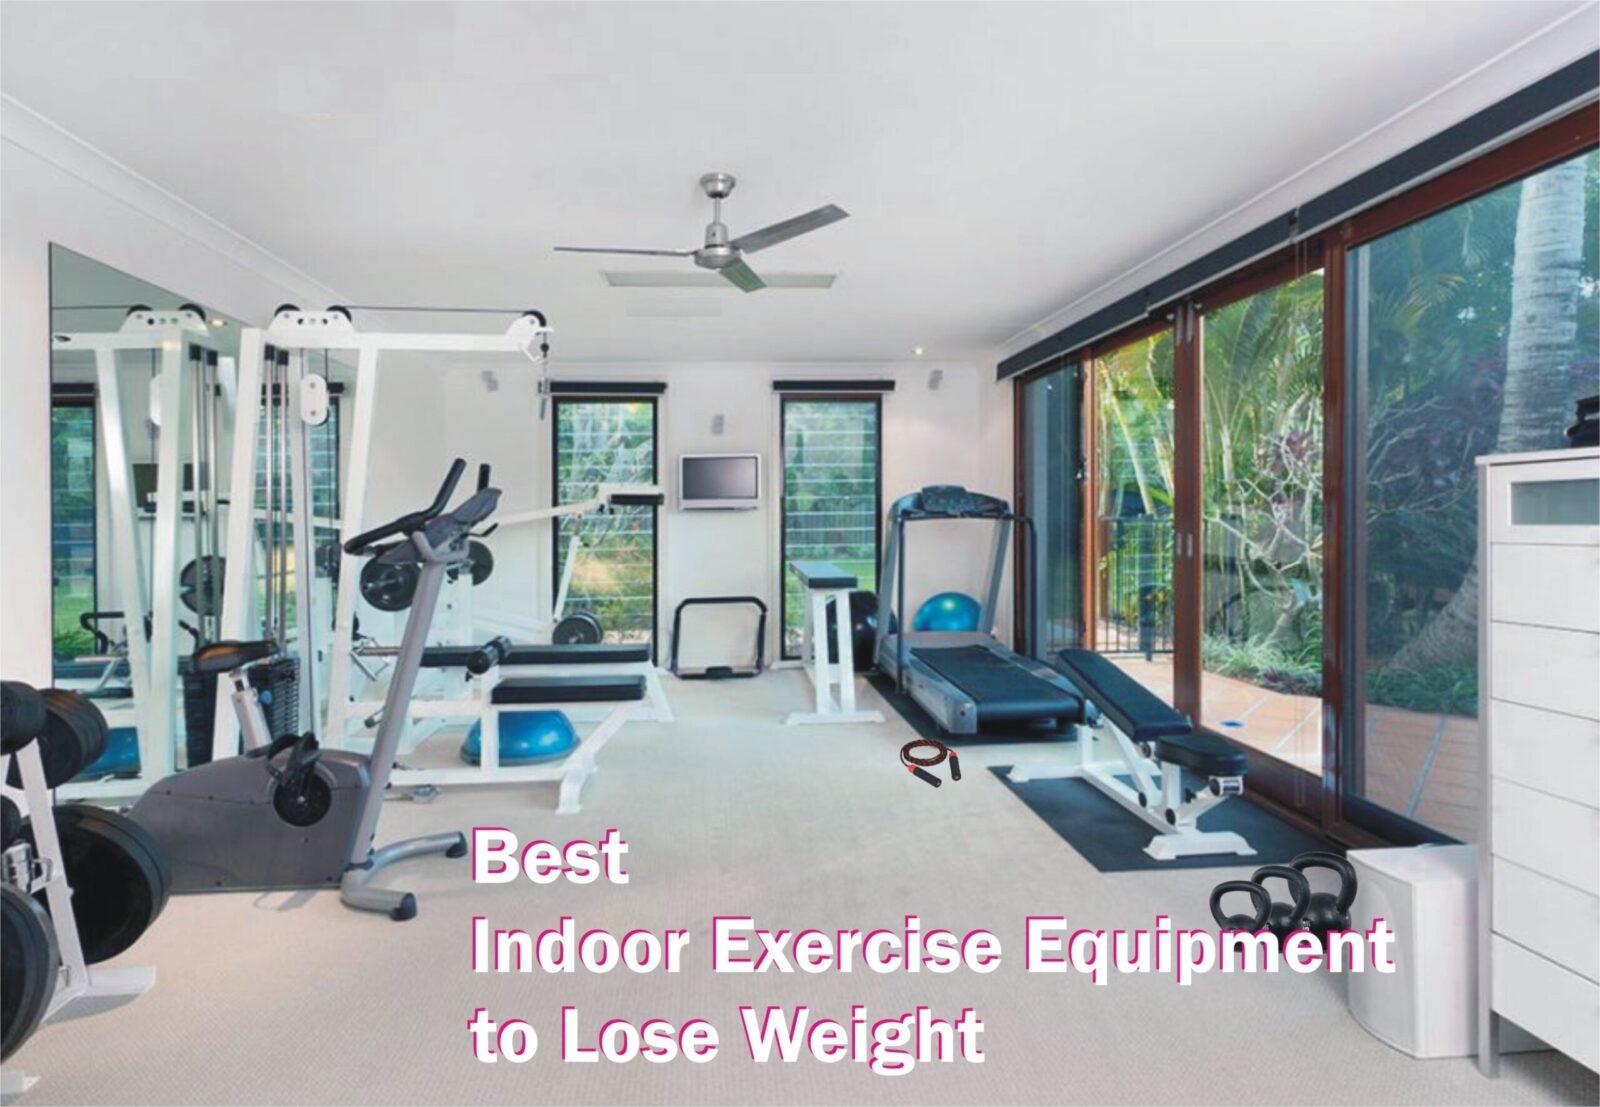 Best indoor exercise equipment to lose weight